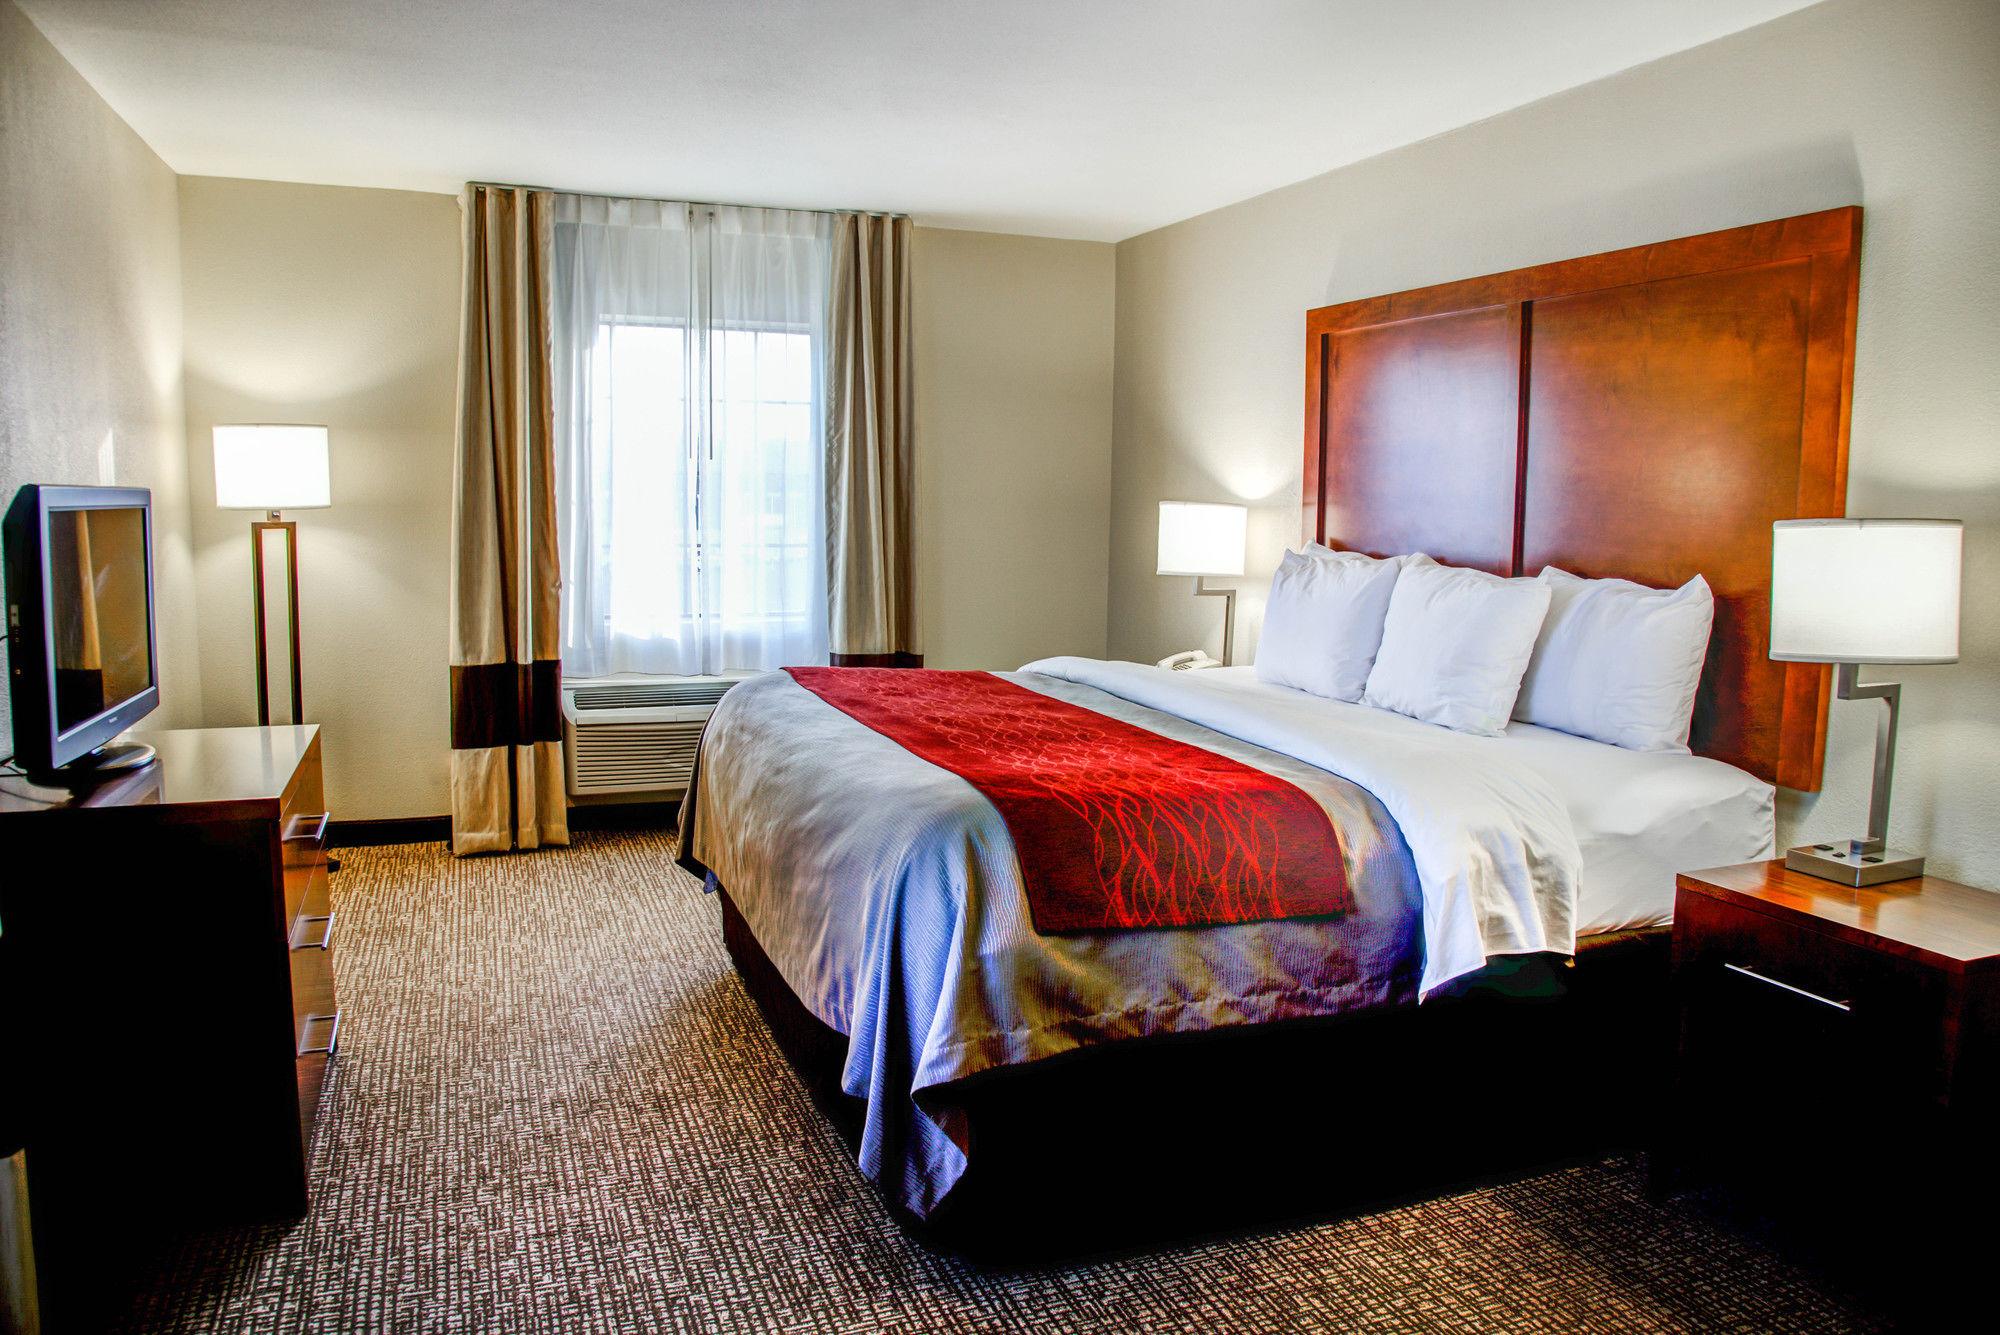 Comfort Inn in Bessemer, AL